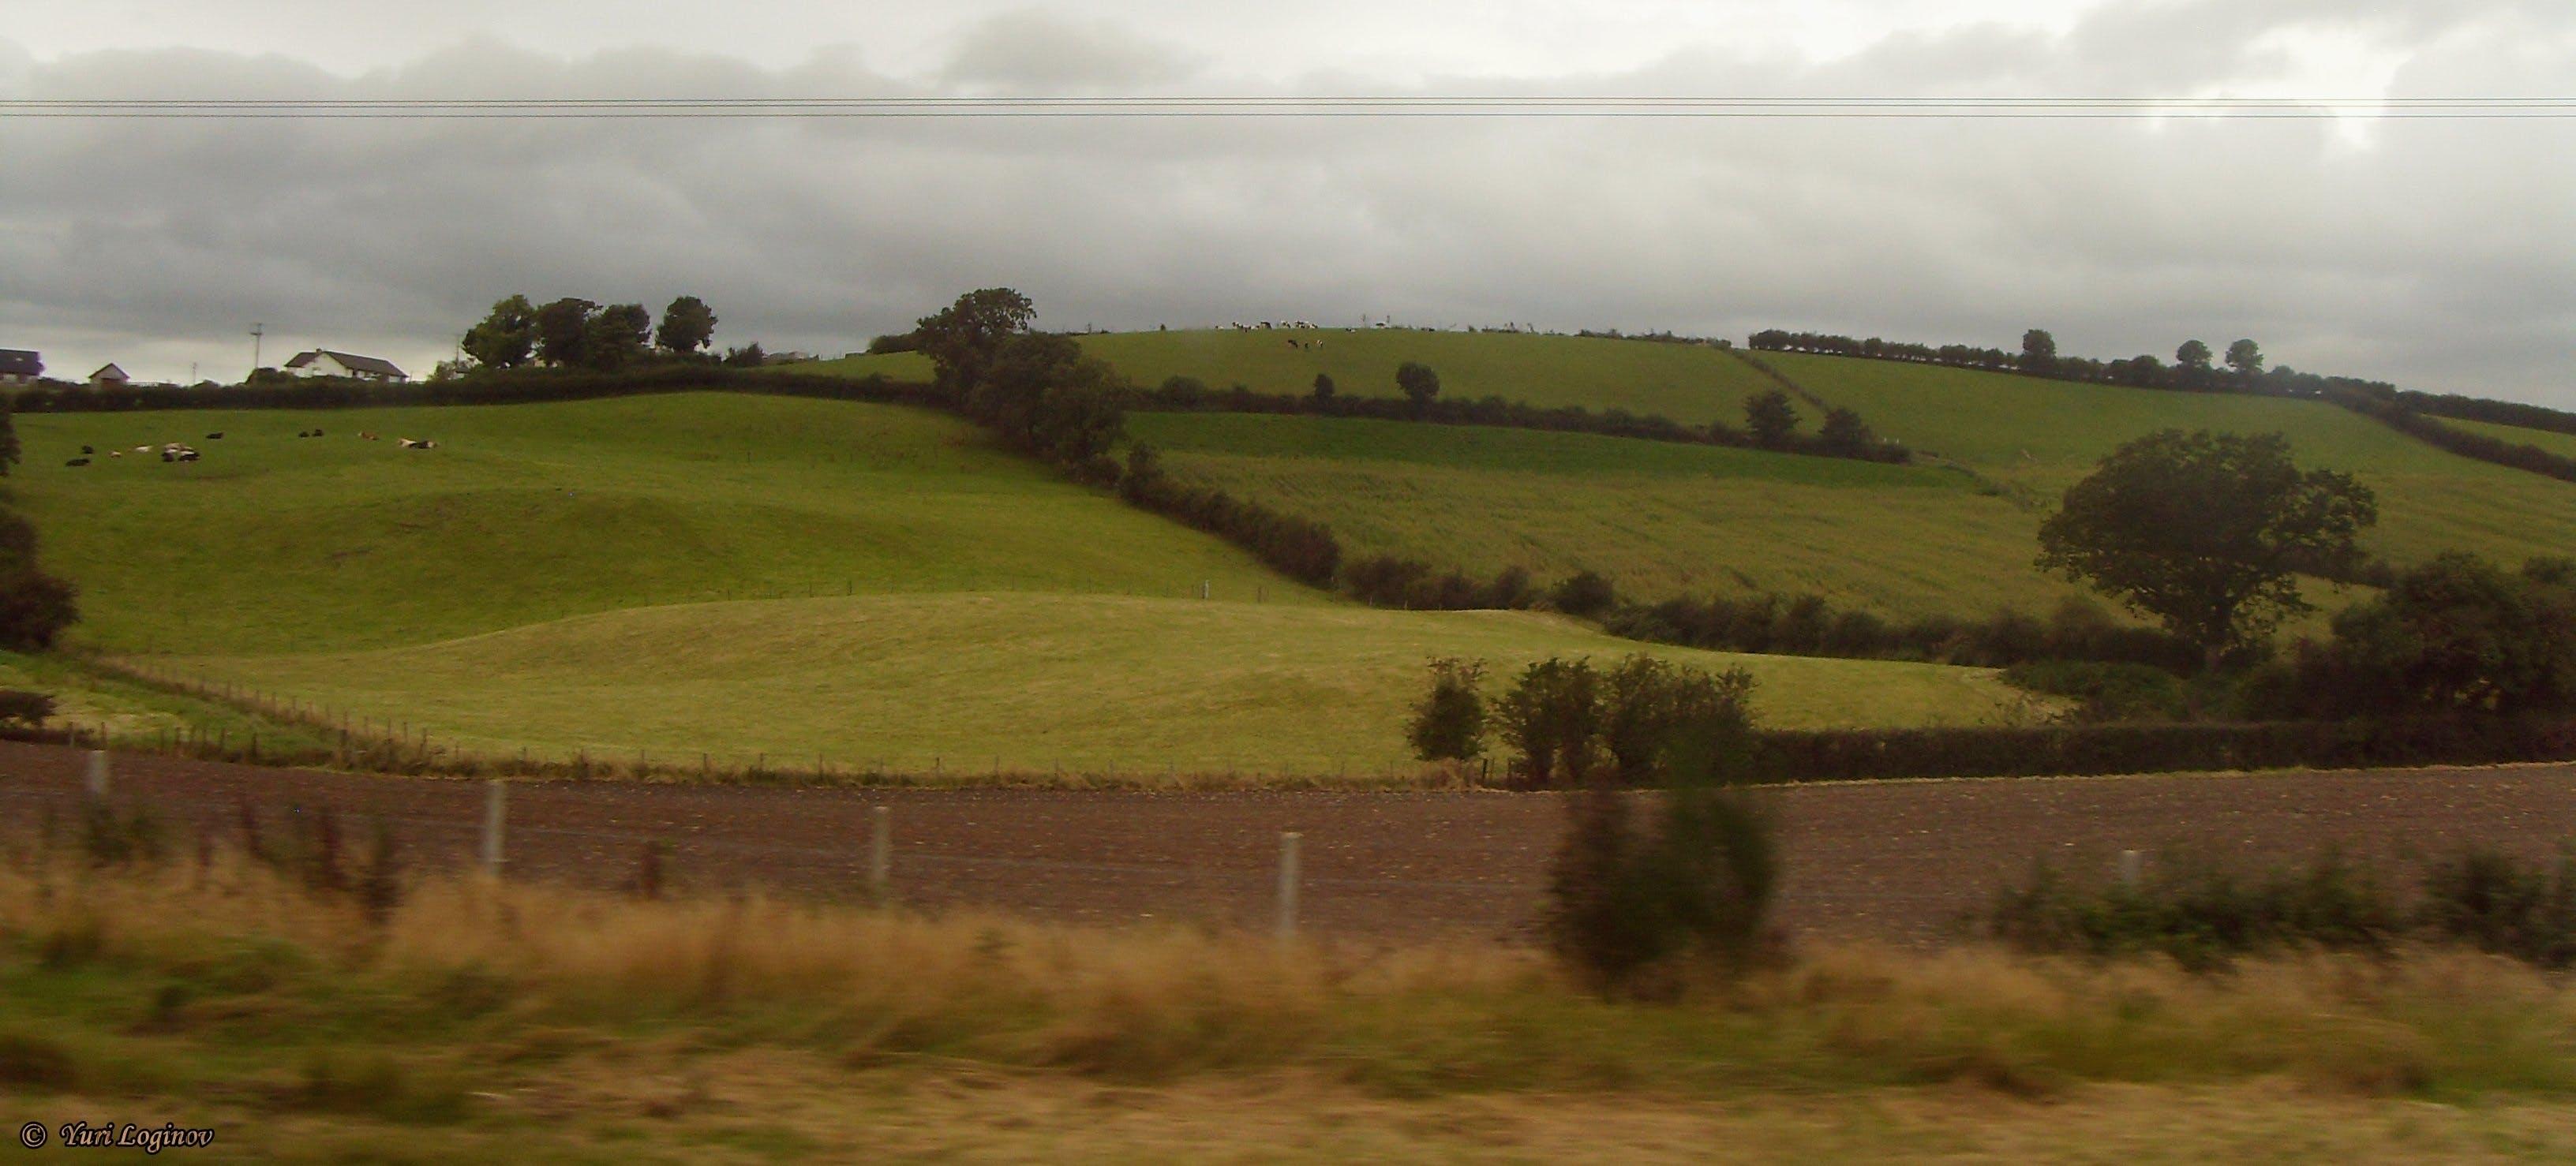 Free stock photo of ireland, Leinster